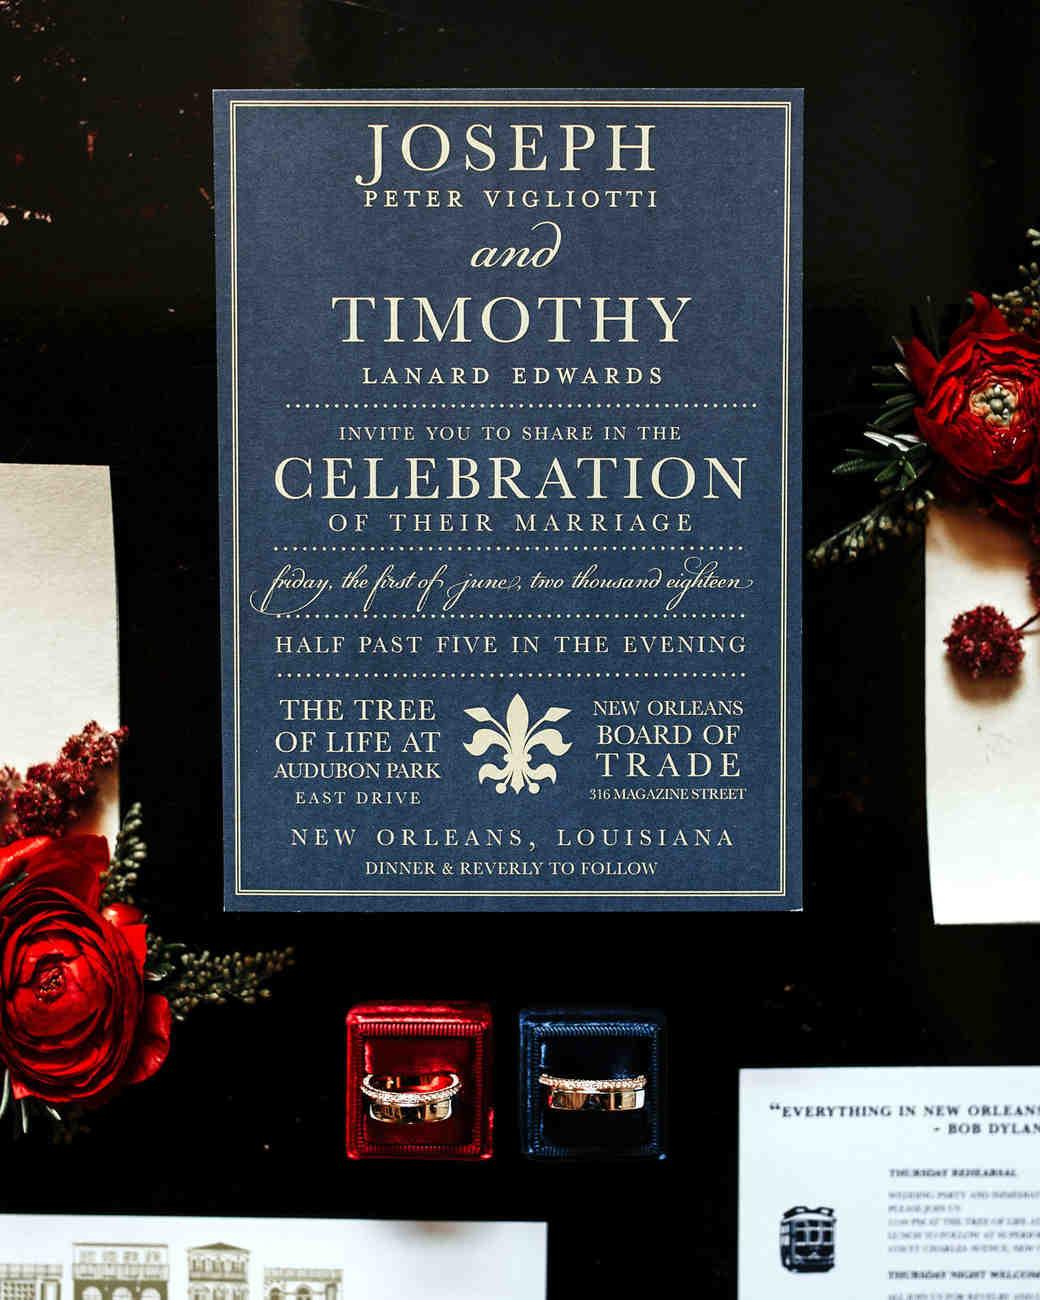 joe-tim-wedding-invitation-0178-1018_vert.jpg